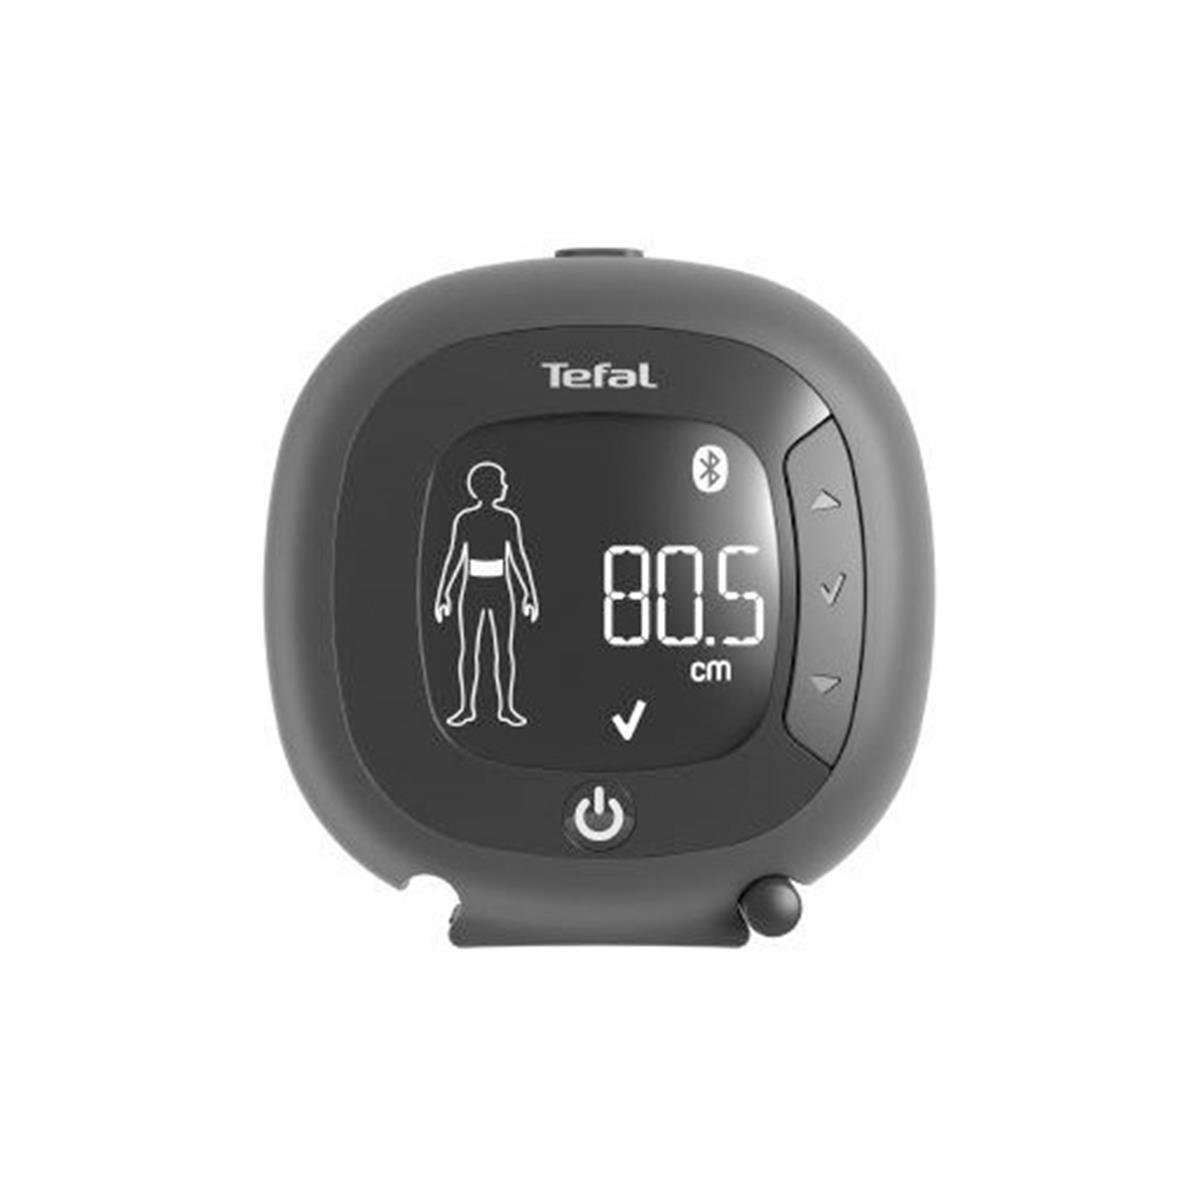 Tefal YD3090S1 Báscula Personal electrónica Negro - Báscula de baño (Báscula Personal electrónica, 180 kg, 100 g, kg, Negro, 10 kg): Amazon.es: Hogar